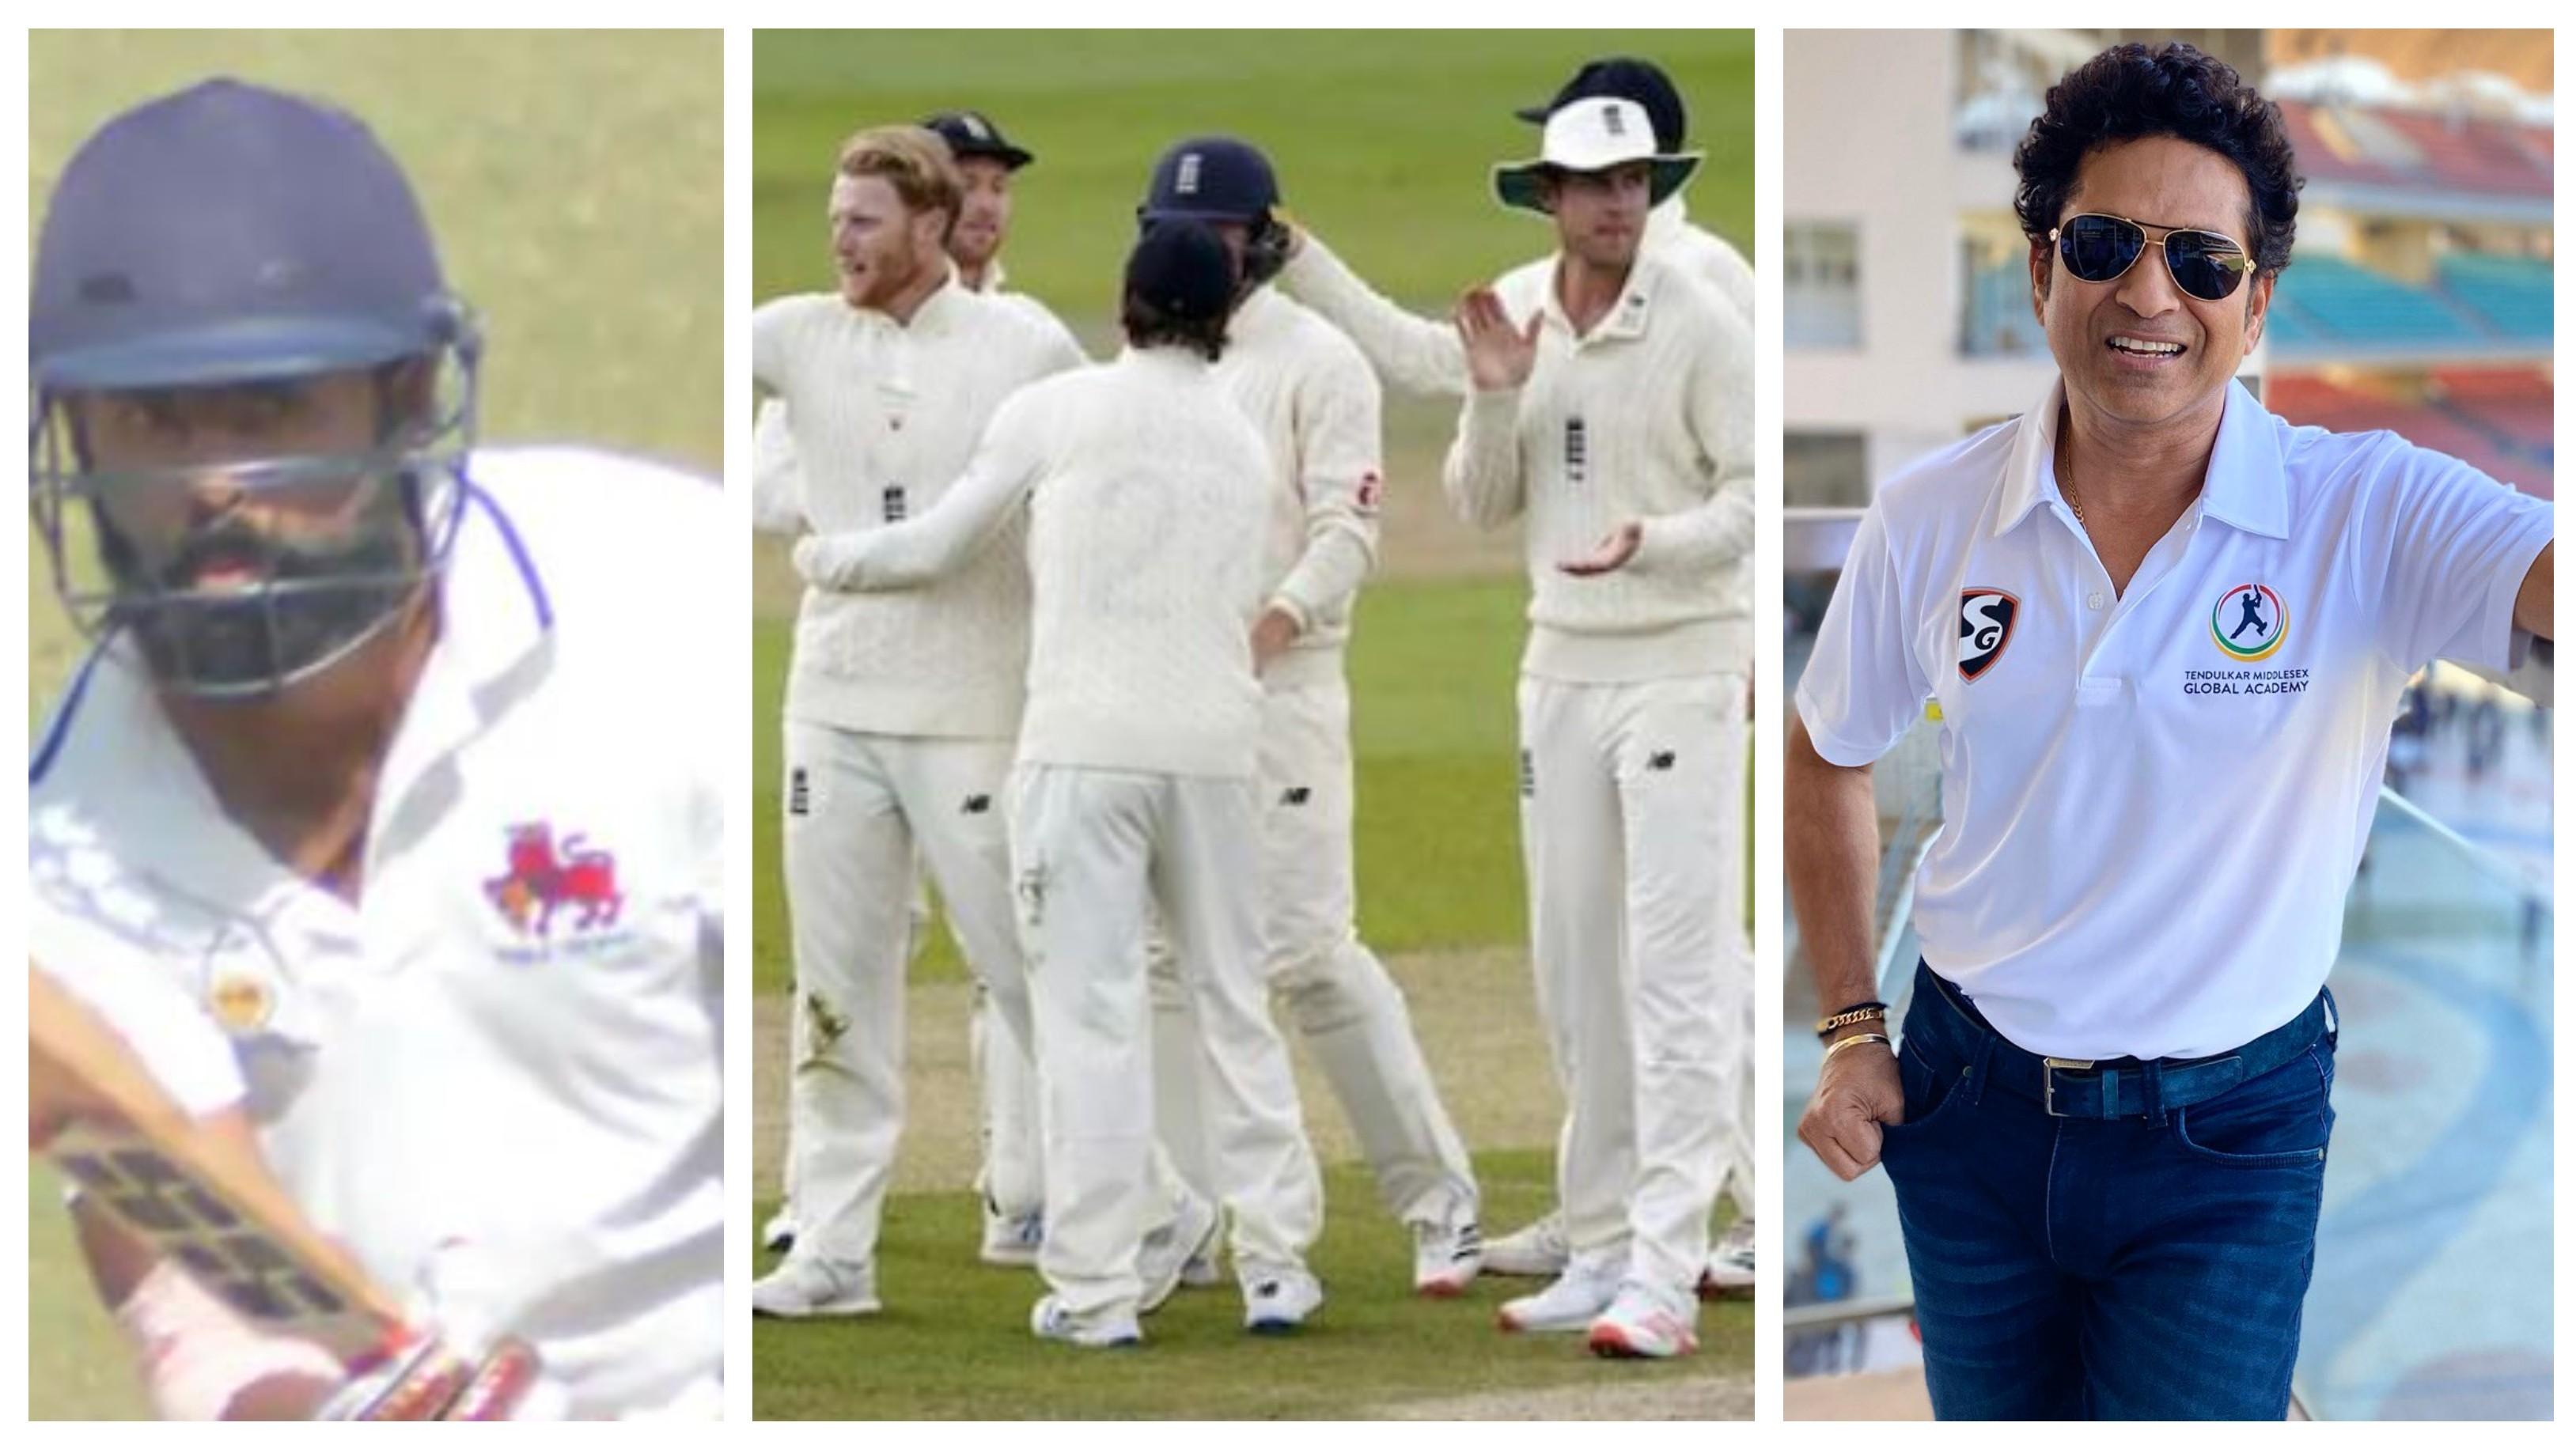 ENG v WI 2020: Surya Kumar Yadav reveals how Sachin Tendulkar predicted England's win accurately